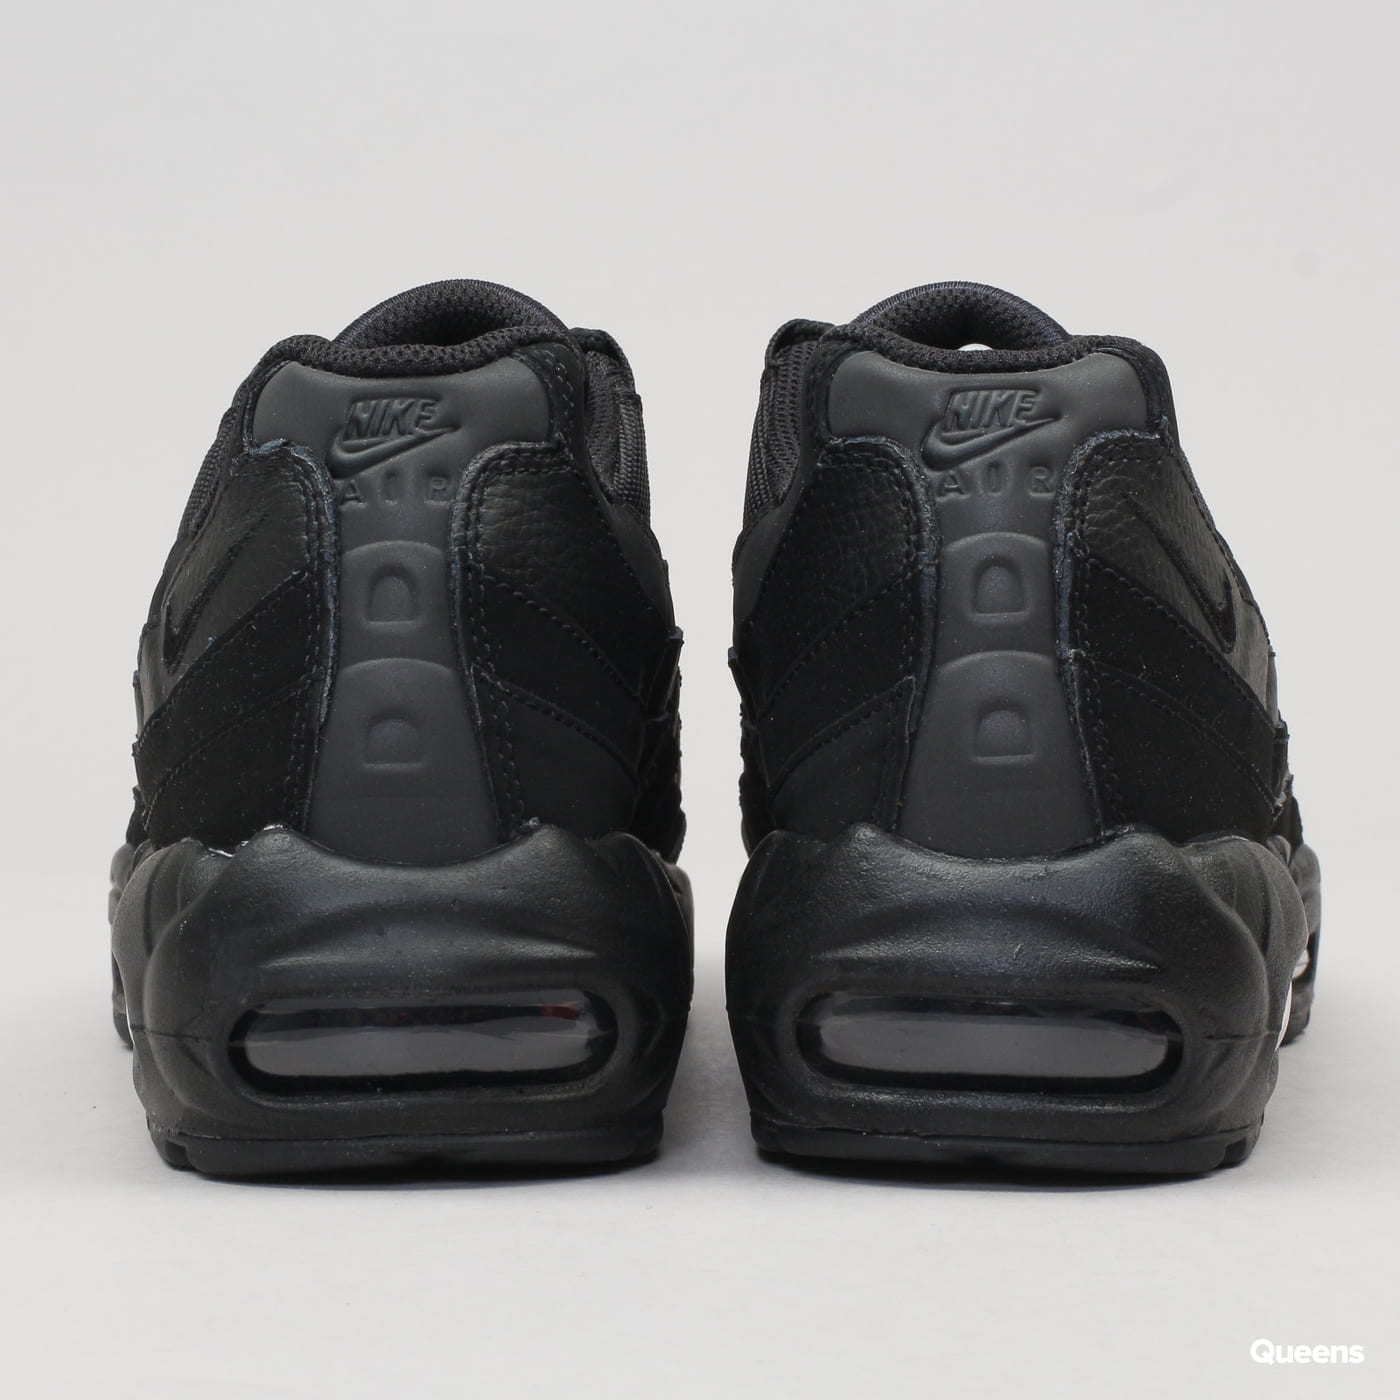 Nike Air Max 95 black / black - anthracite